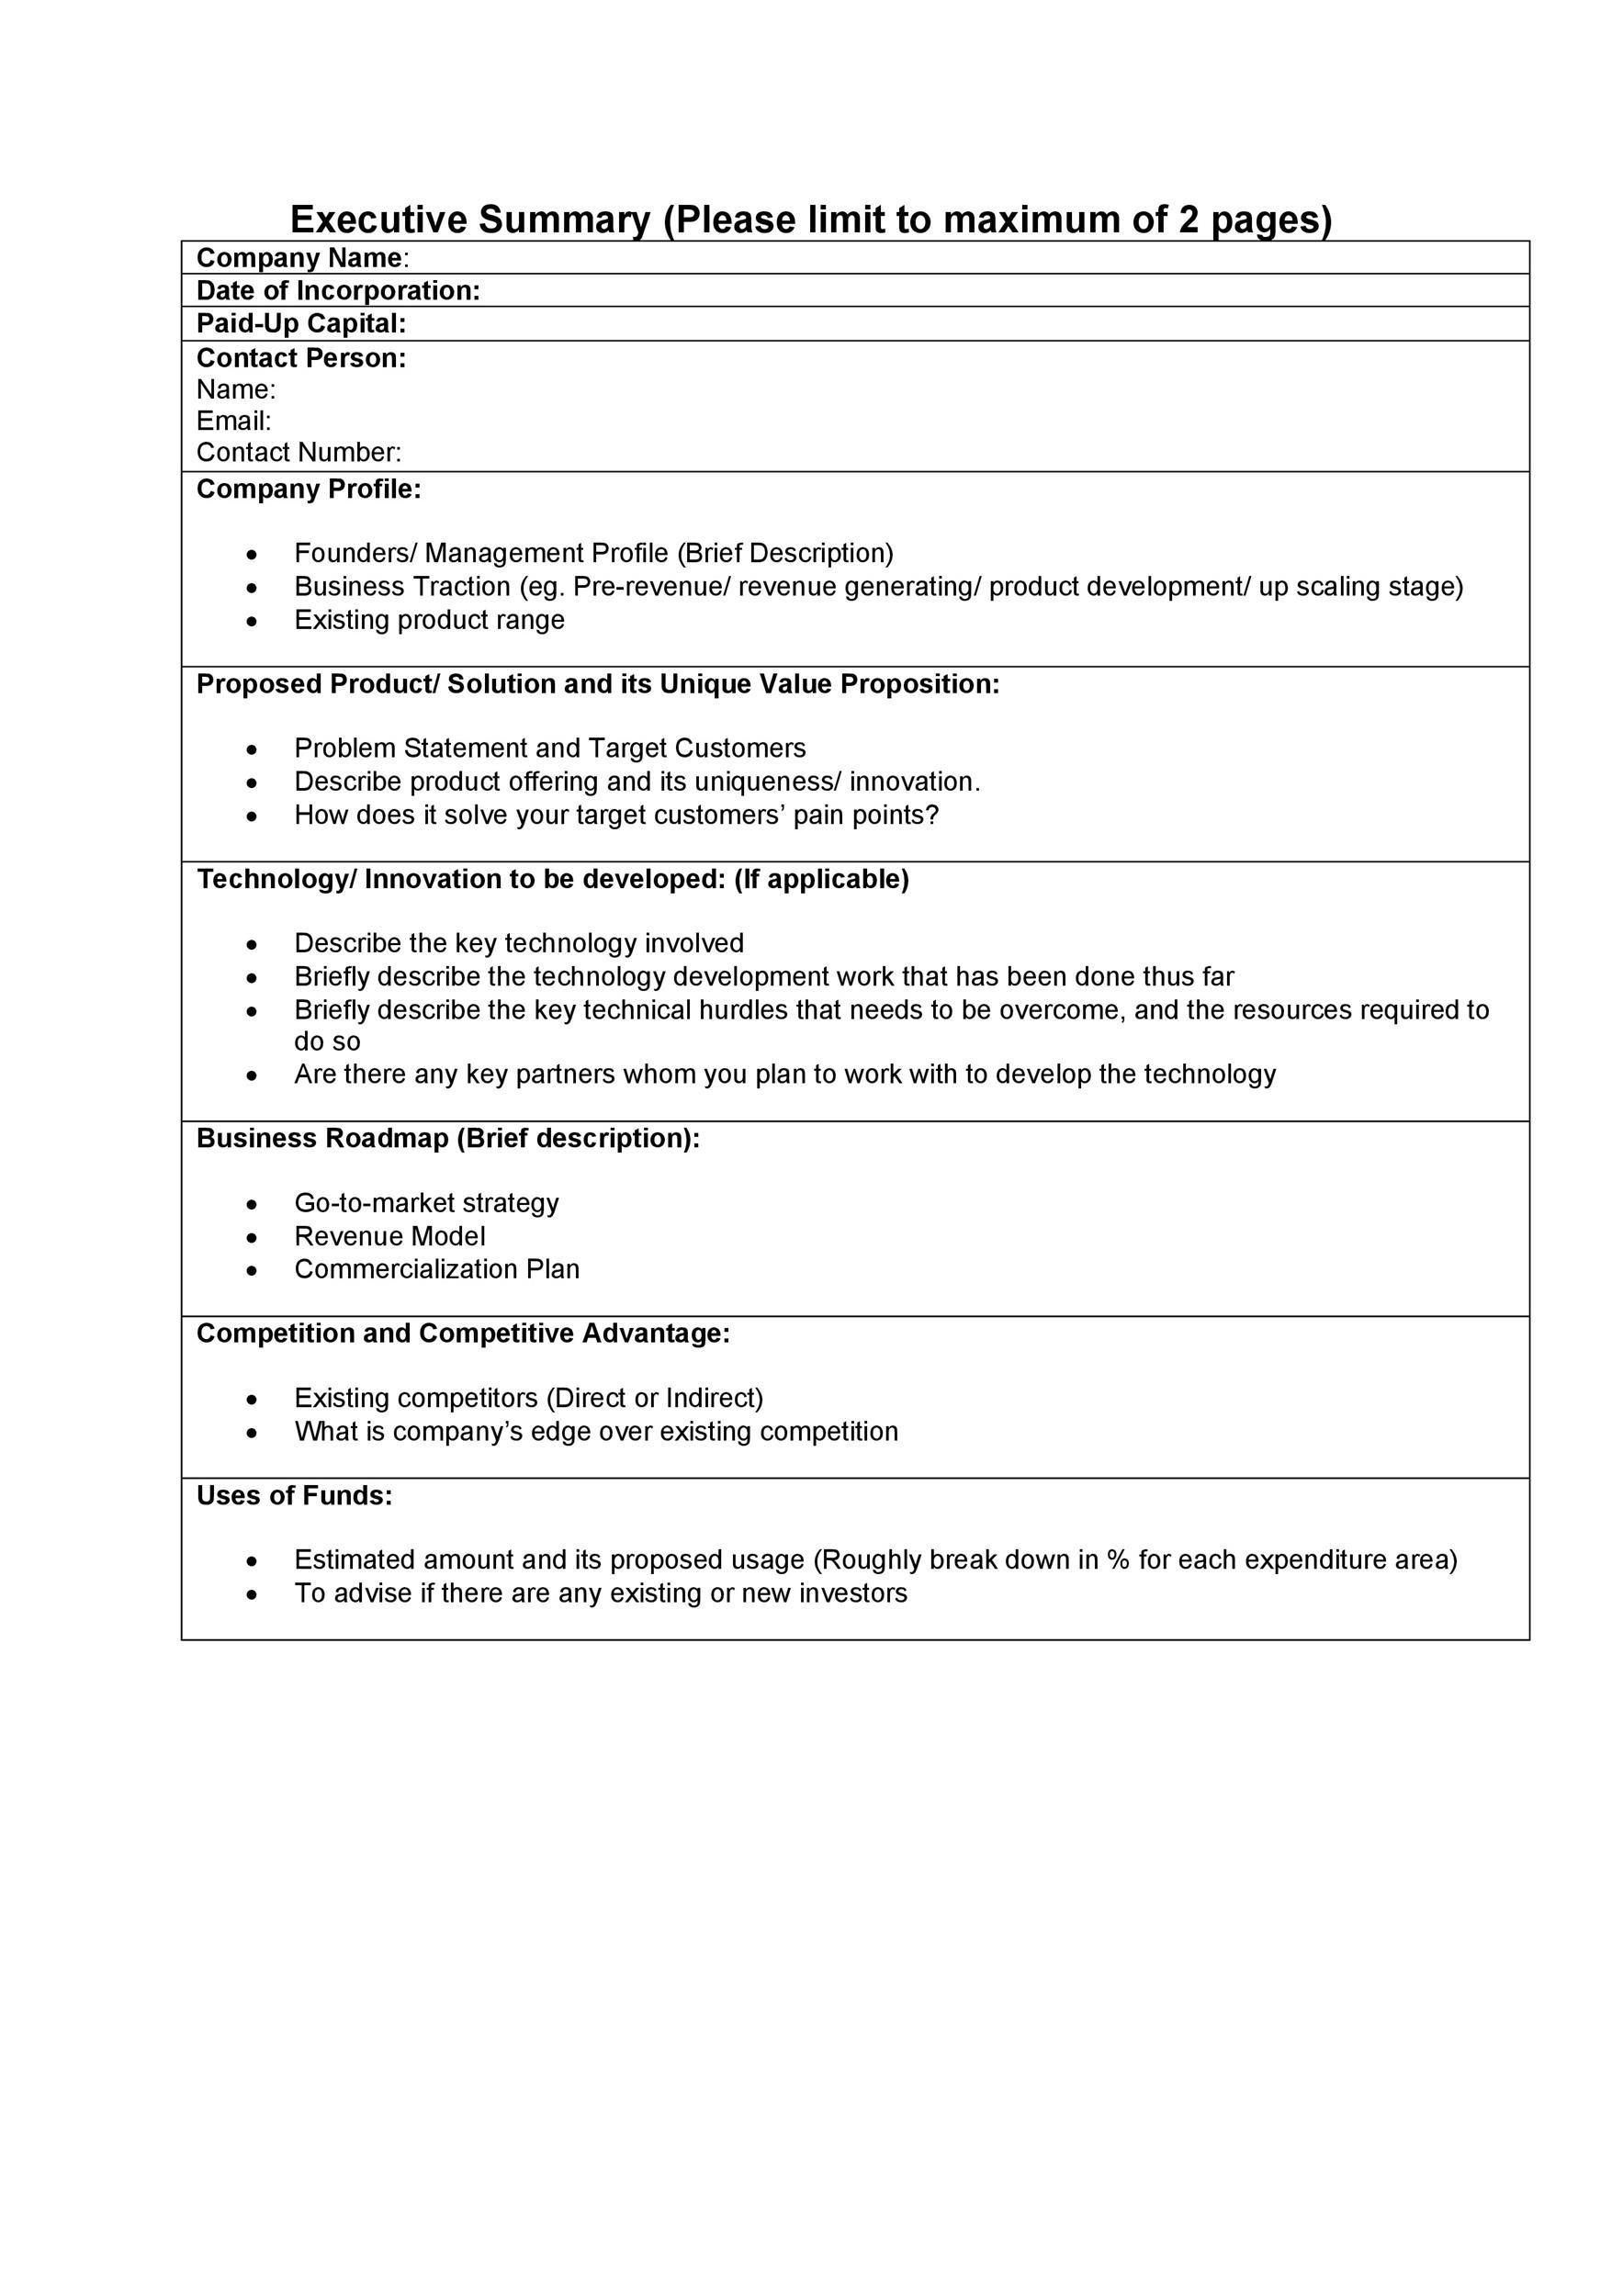 Free Executive Summary Template 30